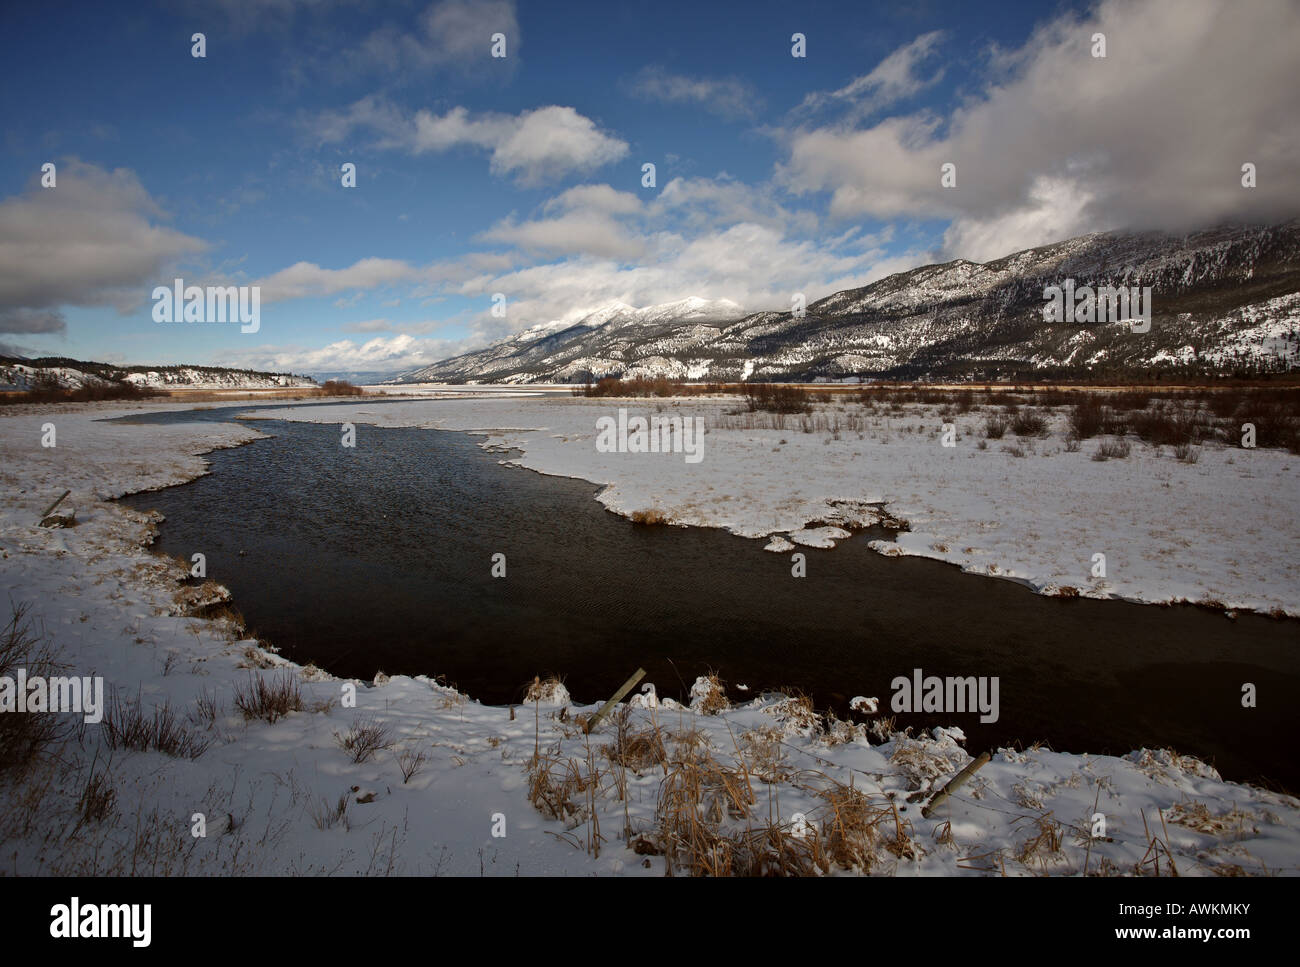 Open water in winter - Stock Image